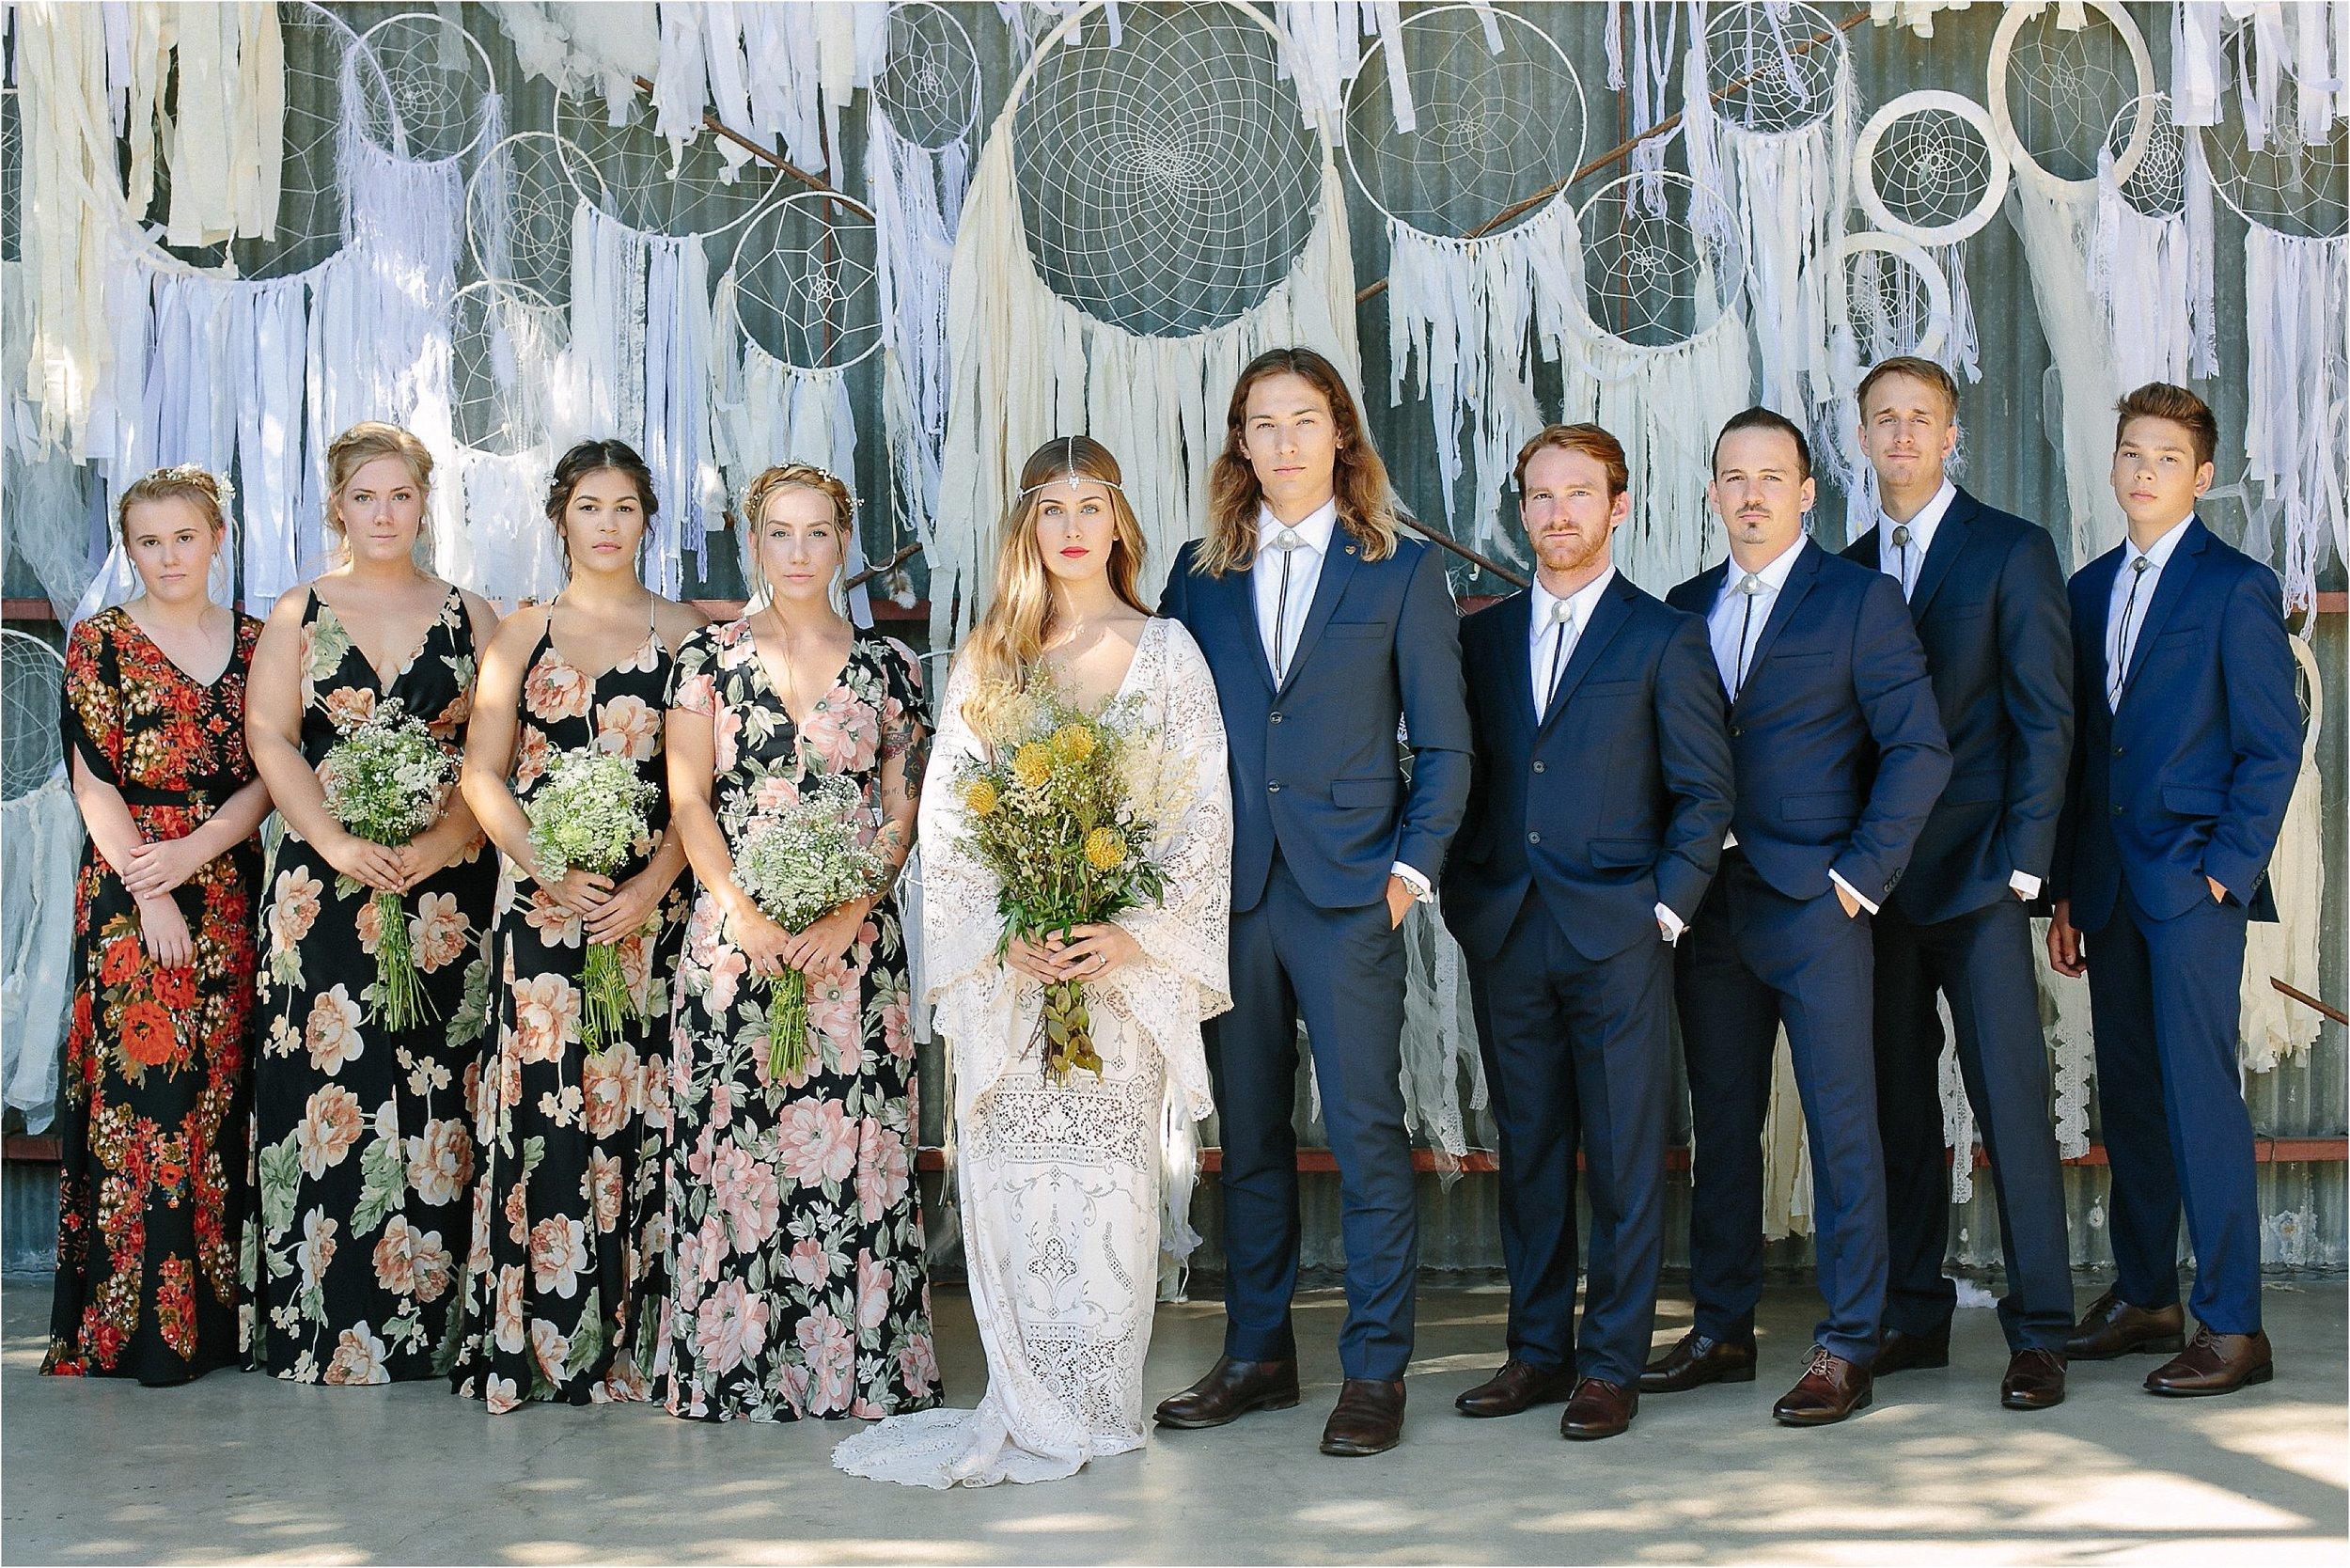 Boho Bridal Party Photo